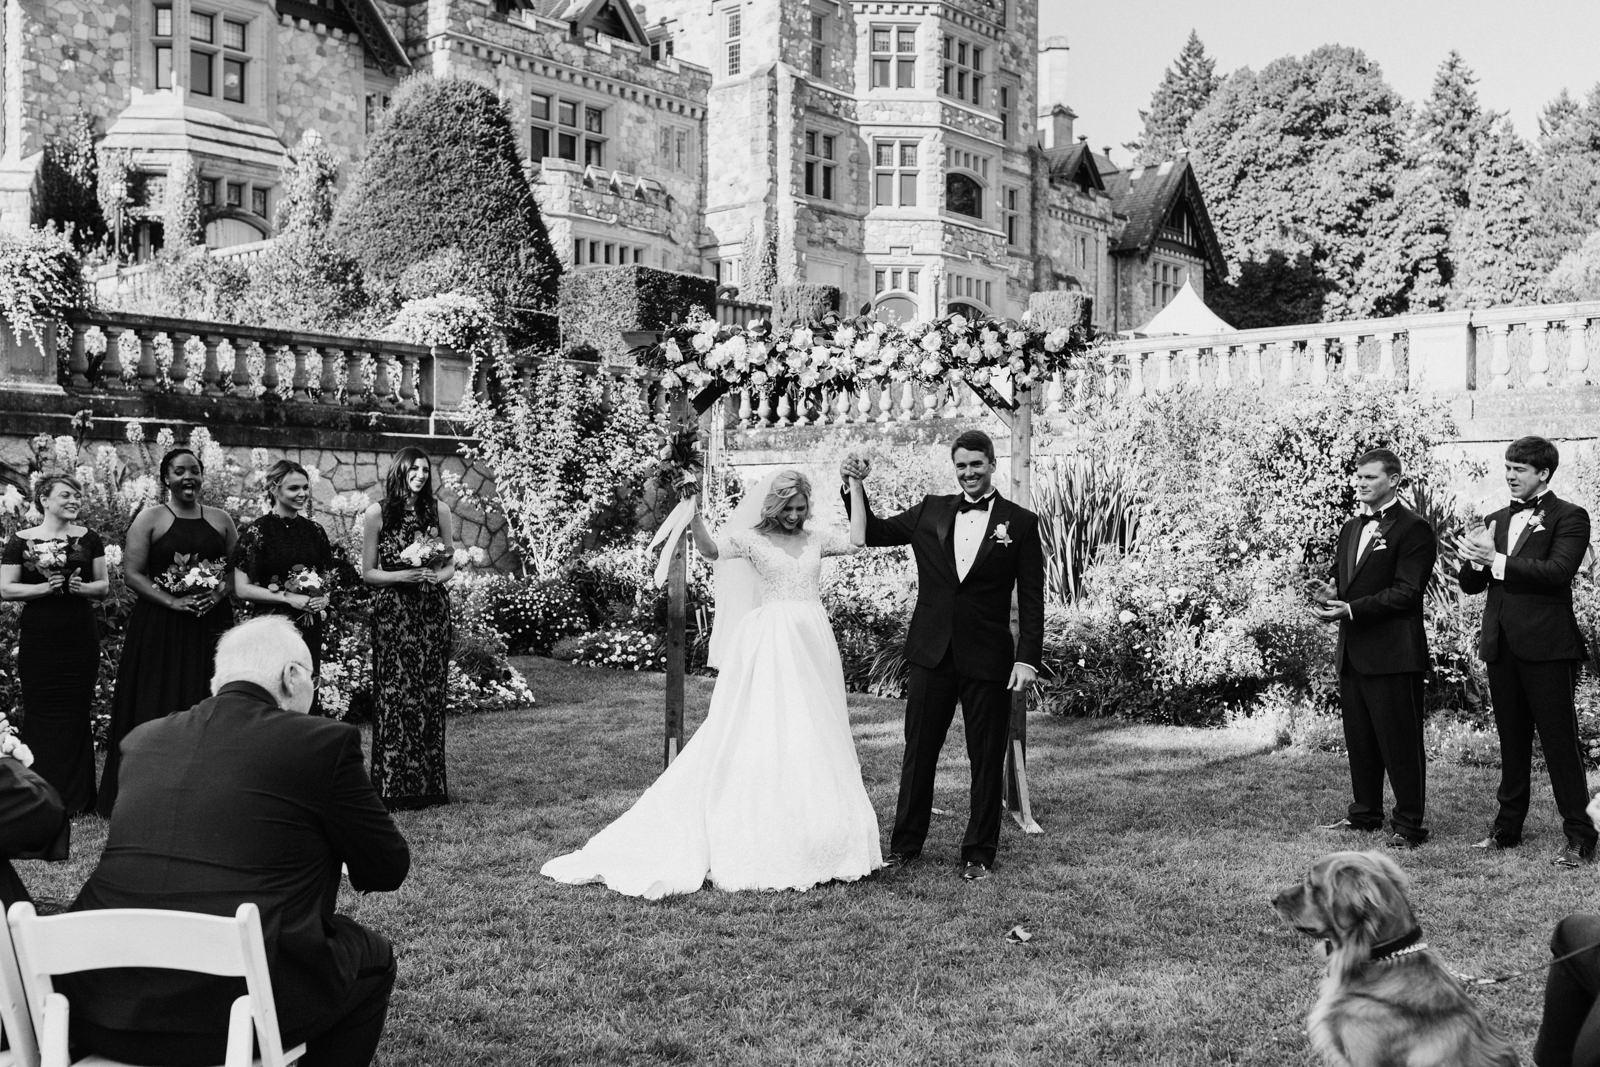 Couple celebrates at Hatley Castle Wedding